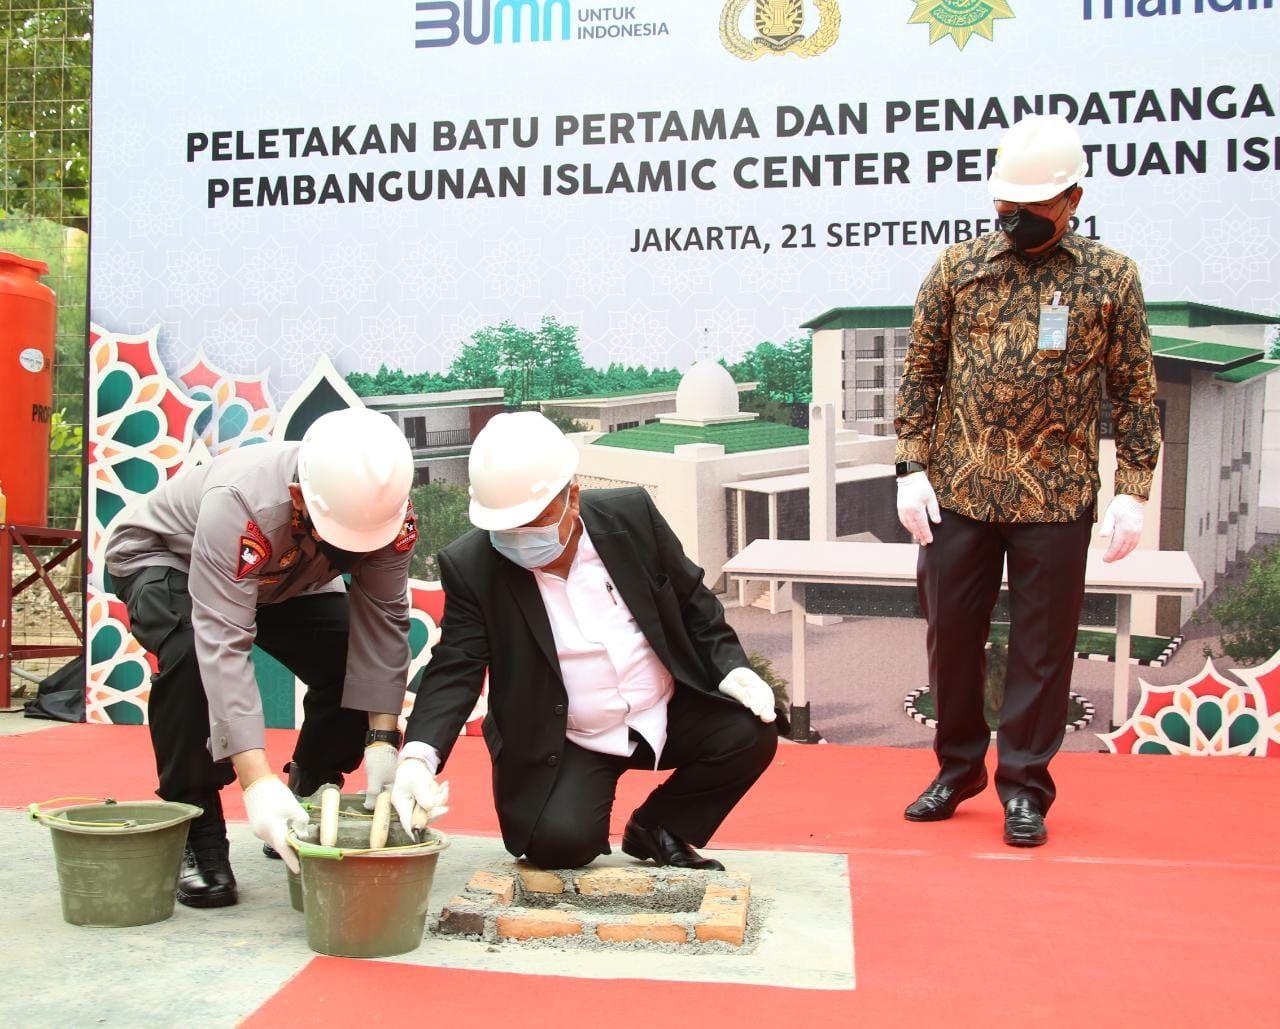 Kapolri Hadiri Peletakan Batu Pertama Islamic Center PERSIS